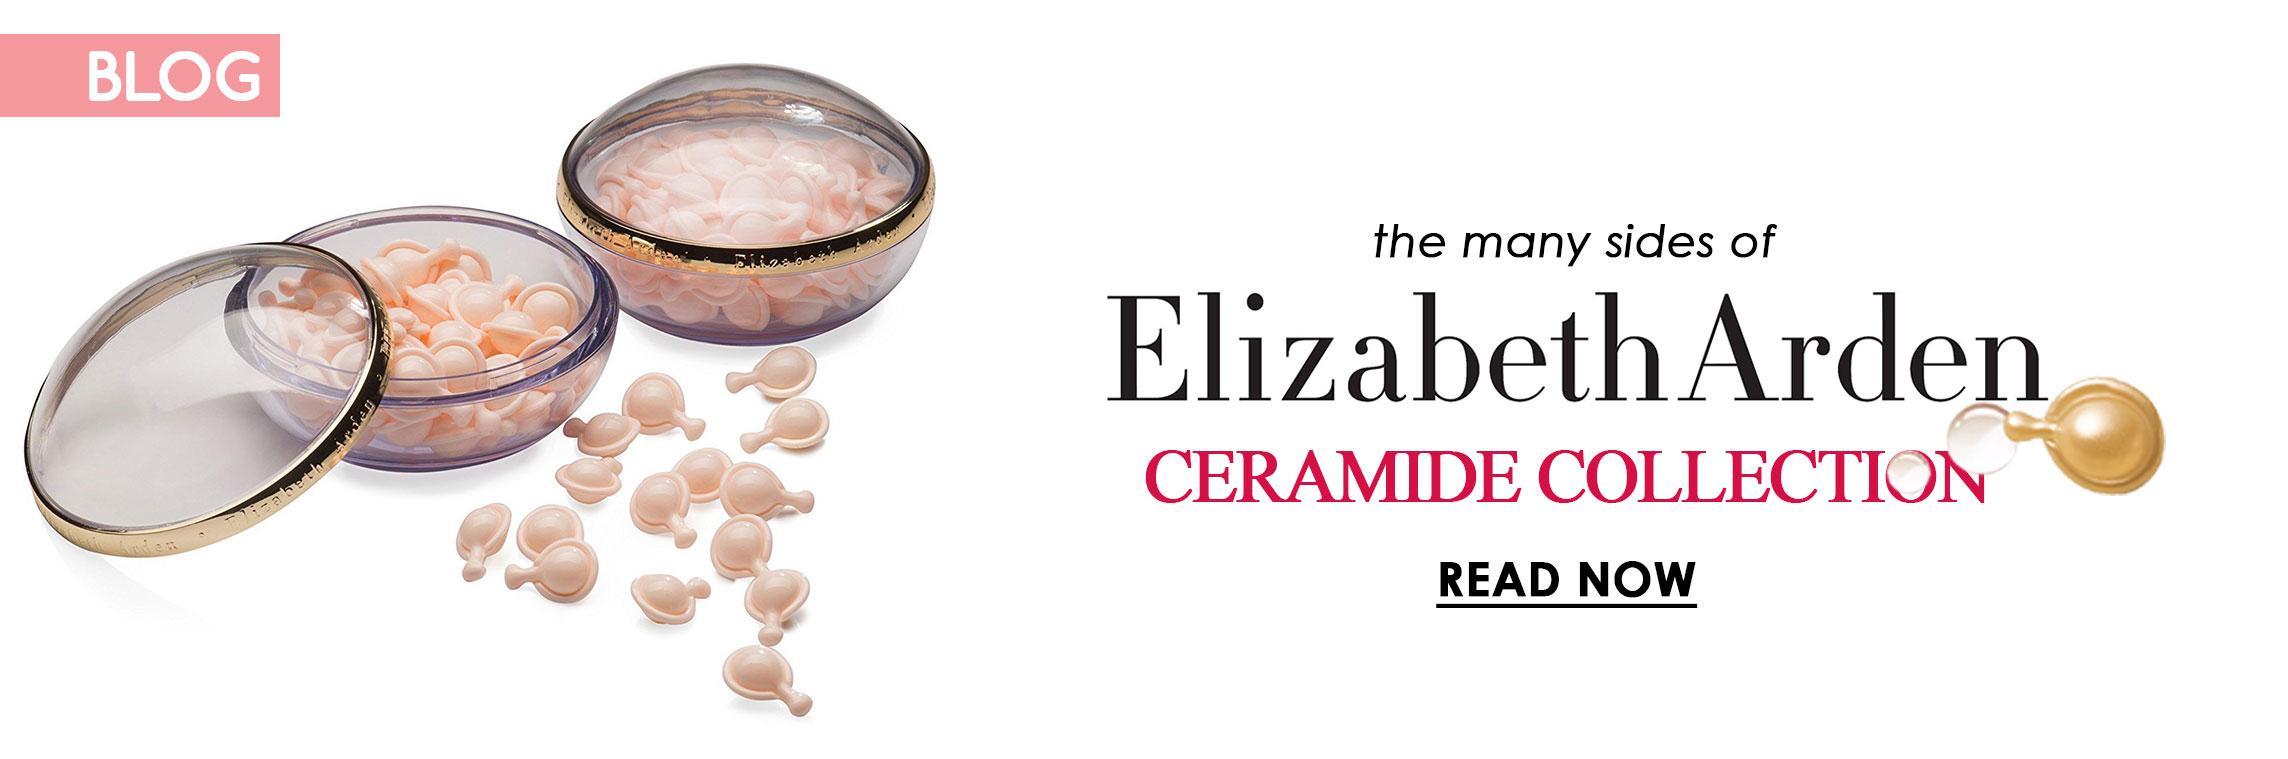 elizabetharden-blog